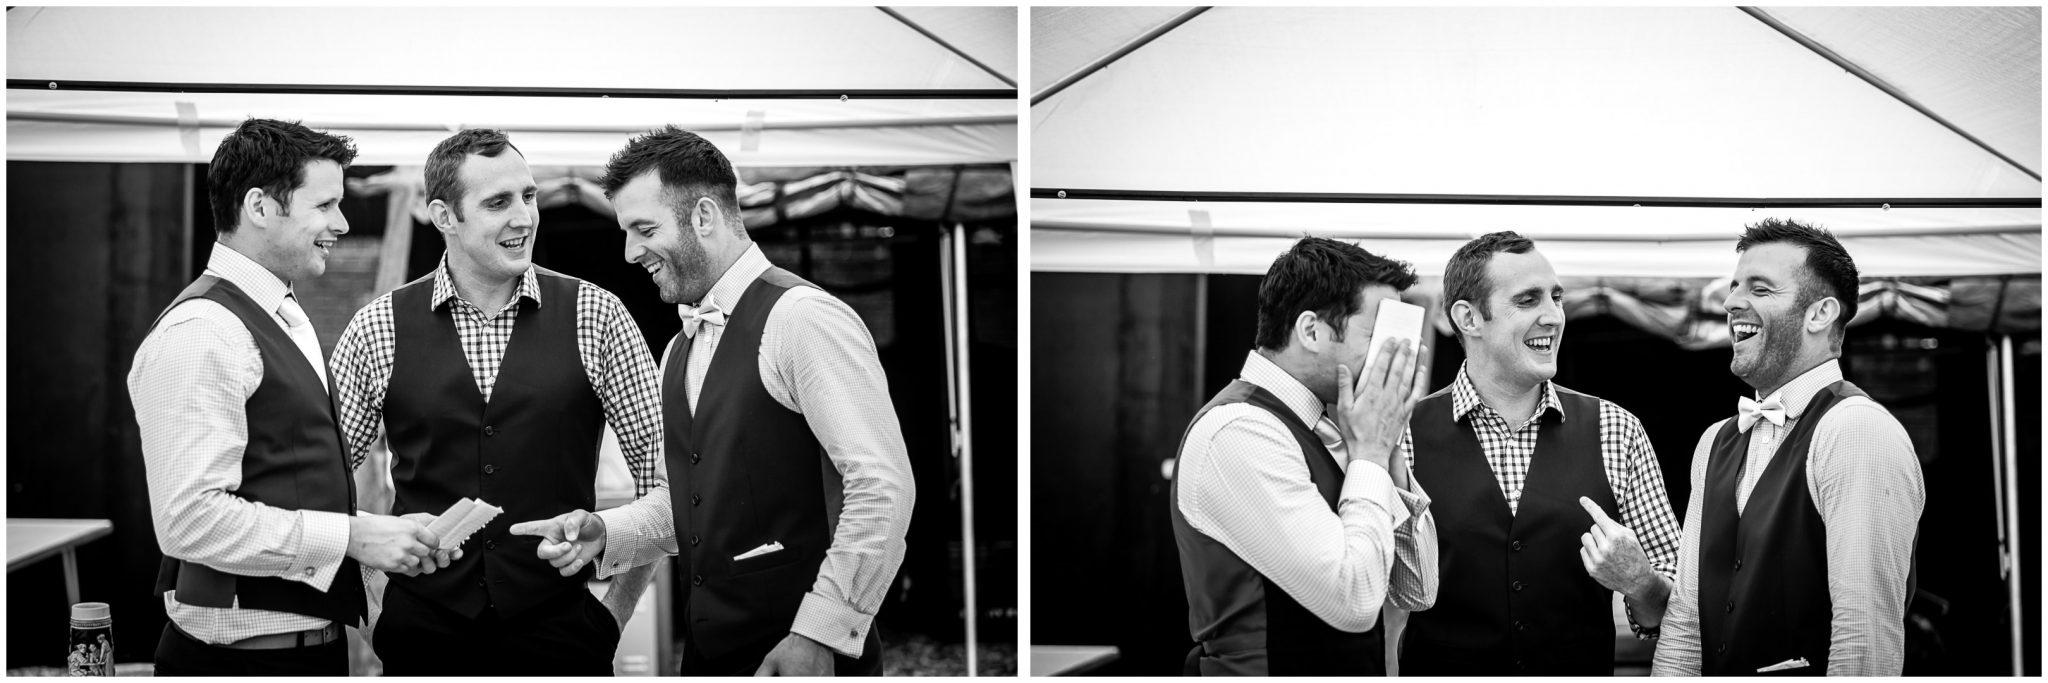 Winchester Great Hall wedding photography groomsmen prepare for speech